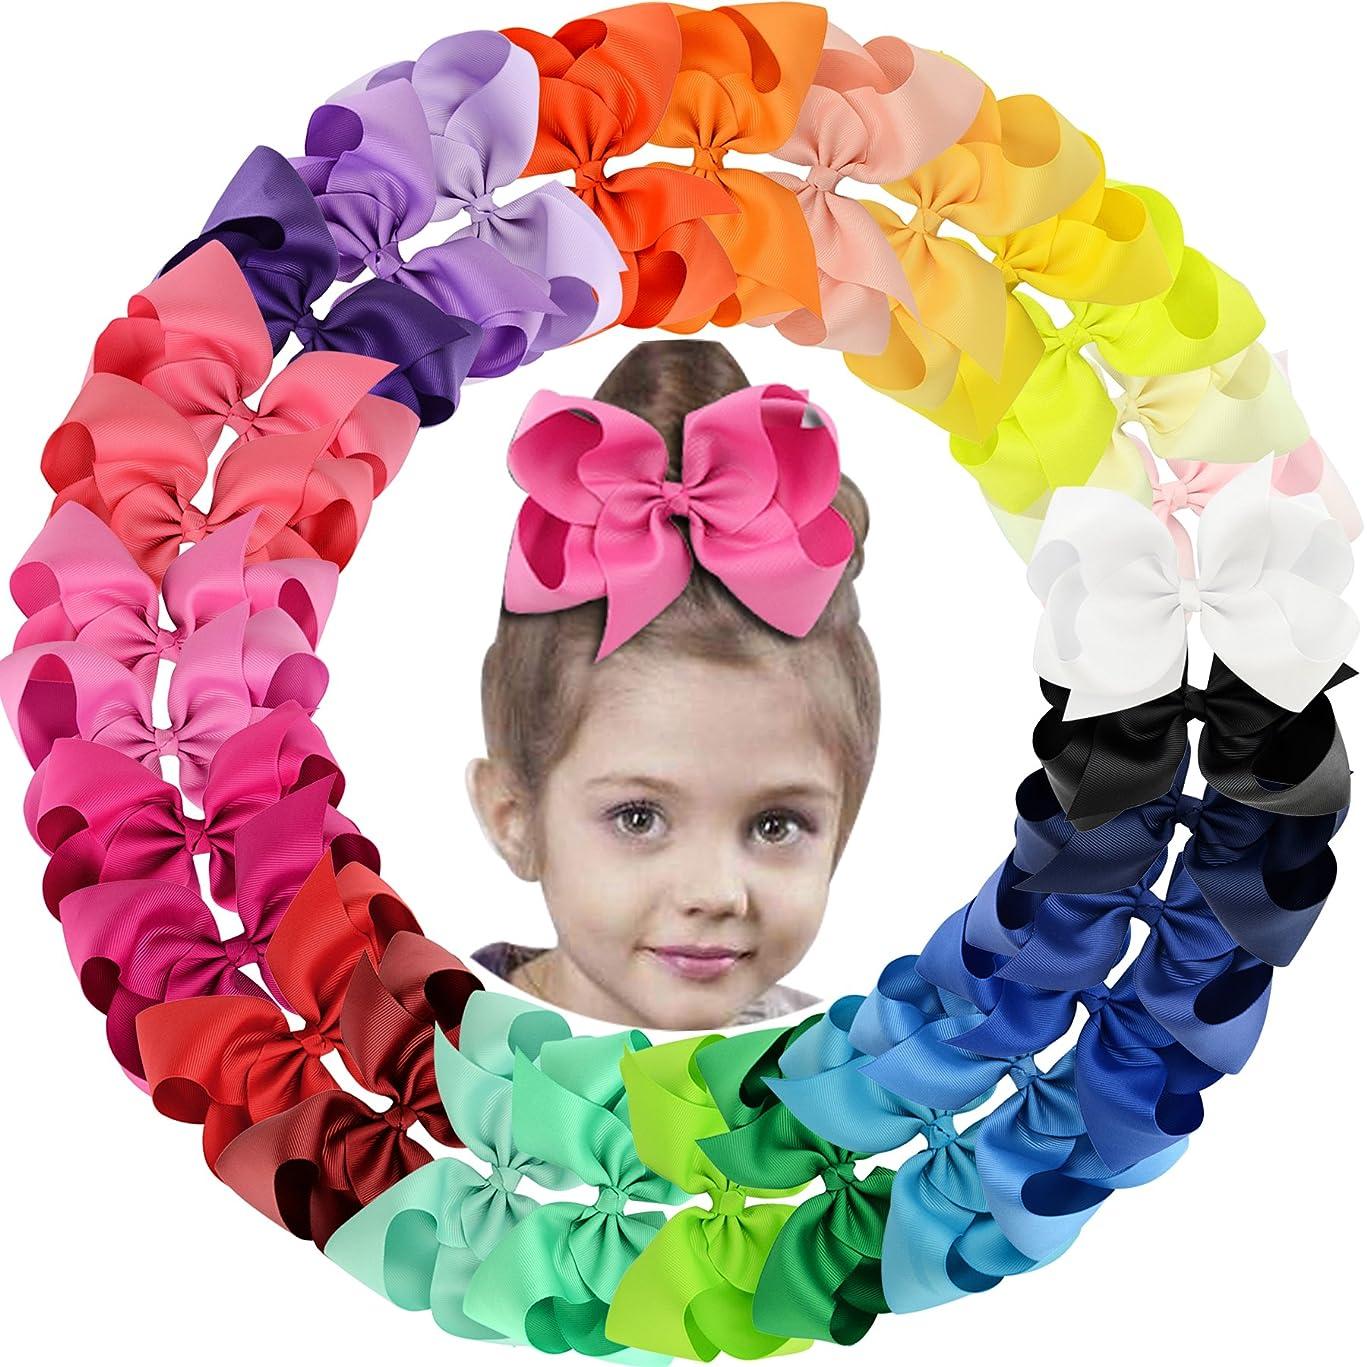 30Pack 6in Grosgrain Ribbon Hair Bows Baby Girl's Clips Large Big Hair Bows Clips For Baby Girls Teens Toddlers